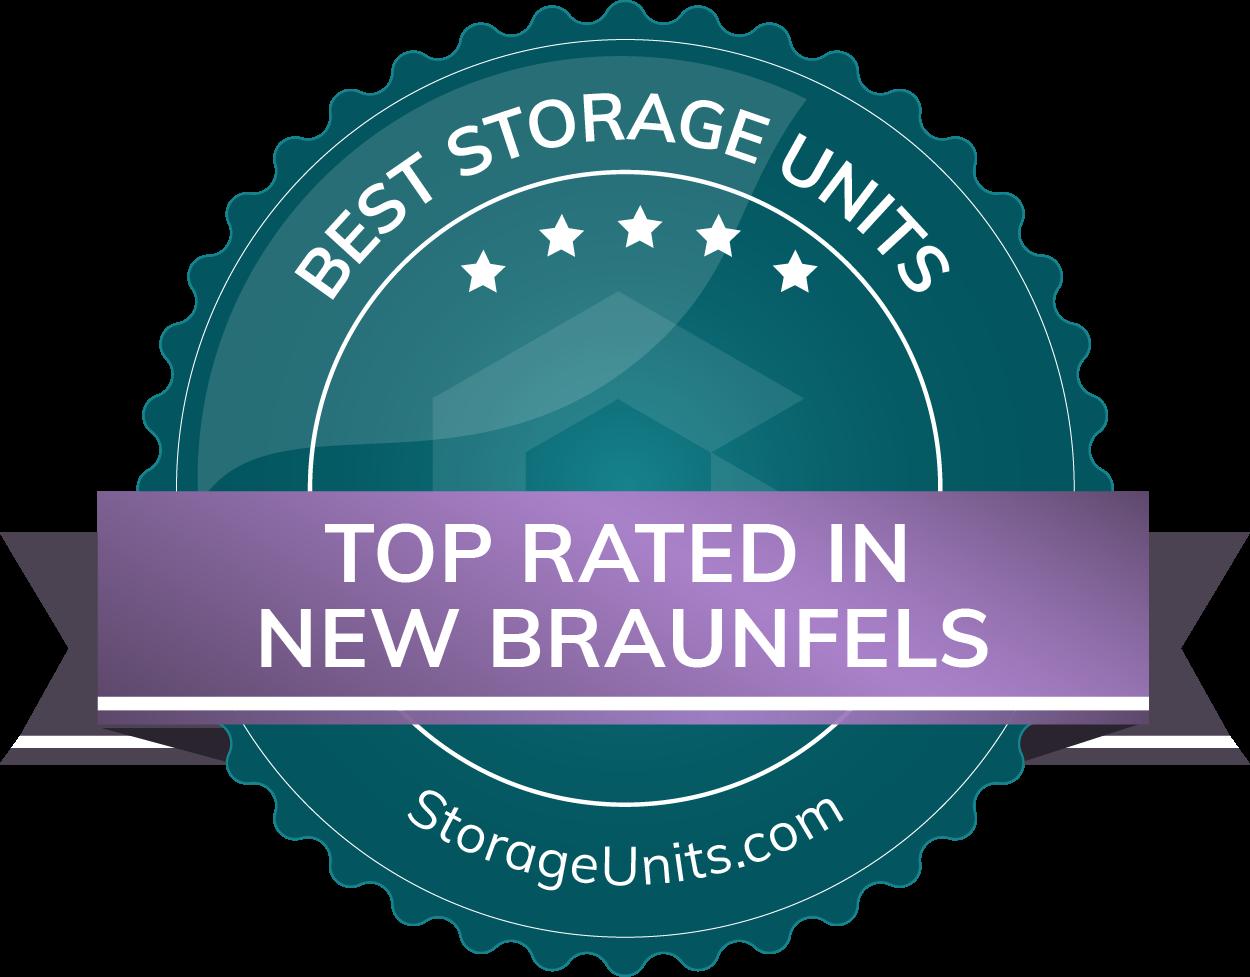 Best in New Braunfels